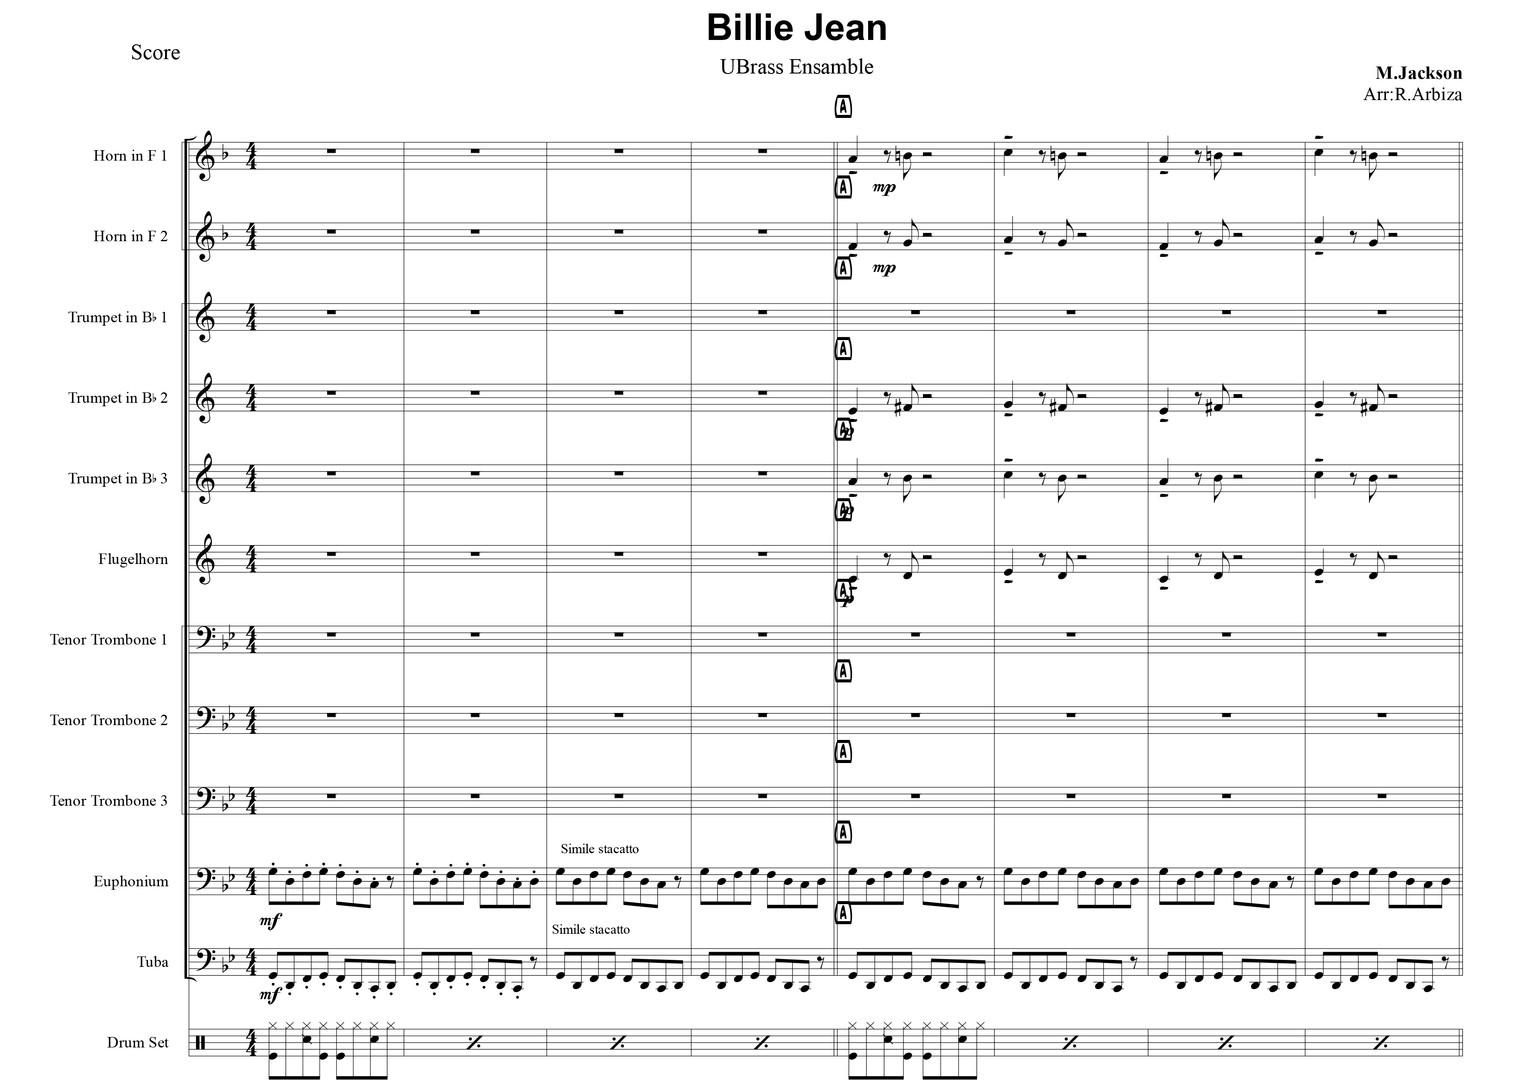 Billie Jean Ensamble-1.jpg